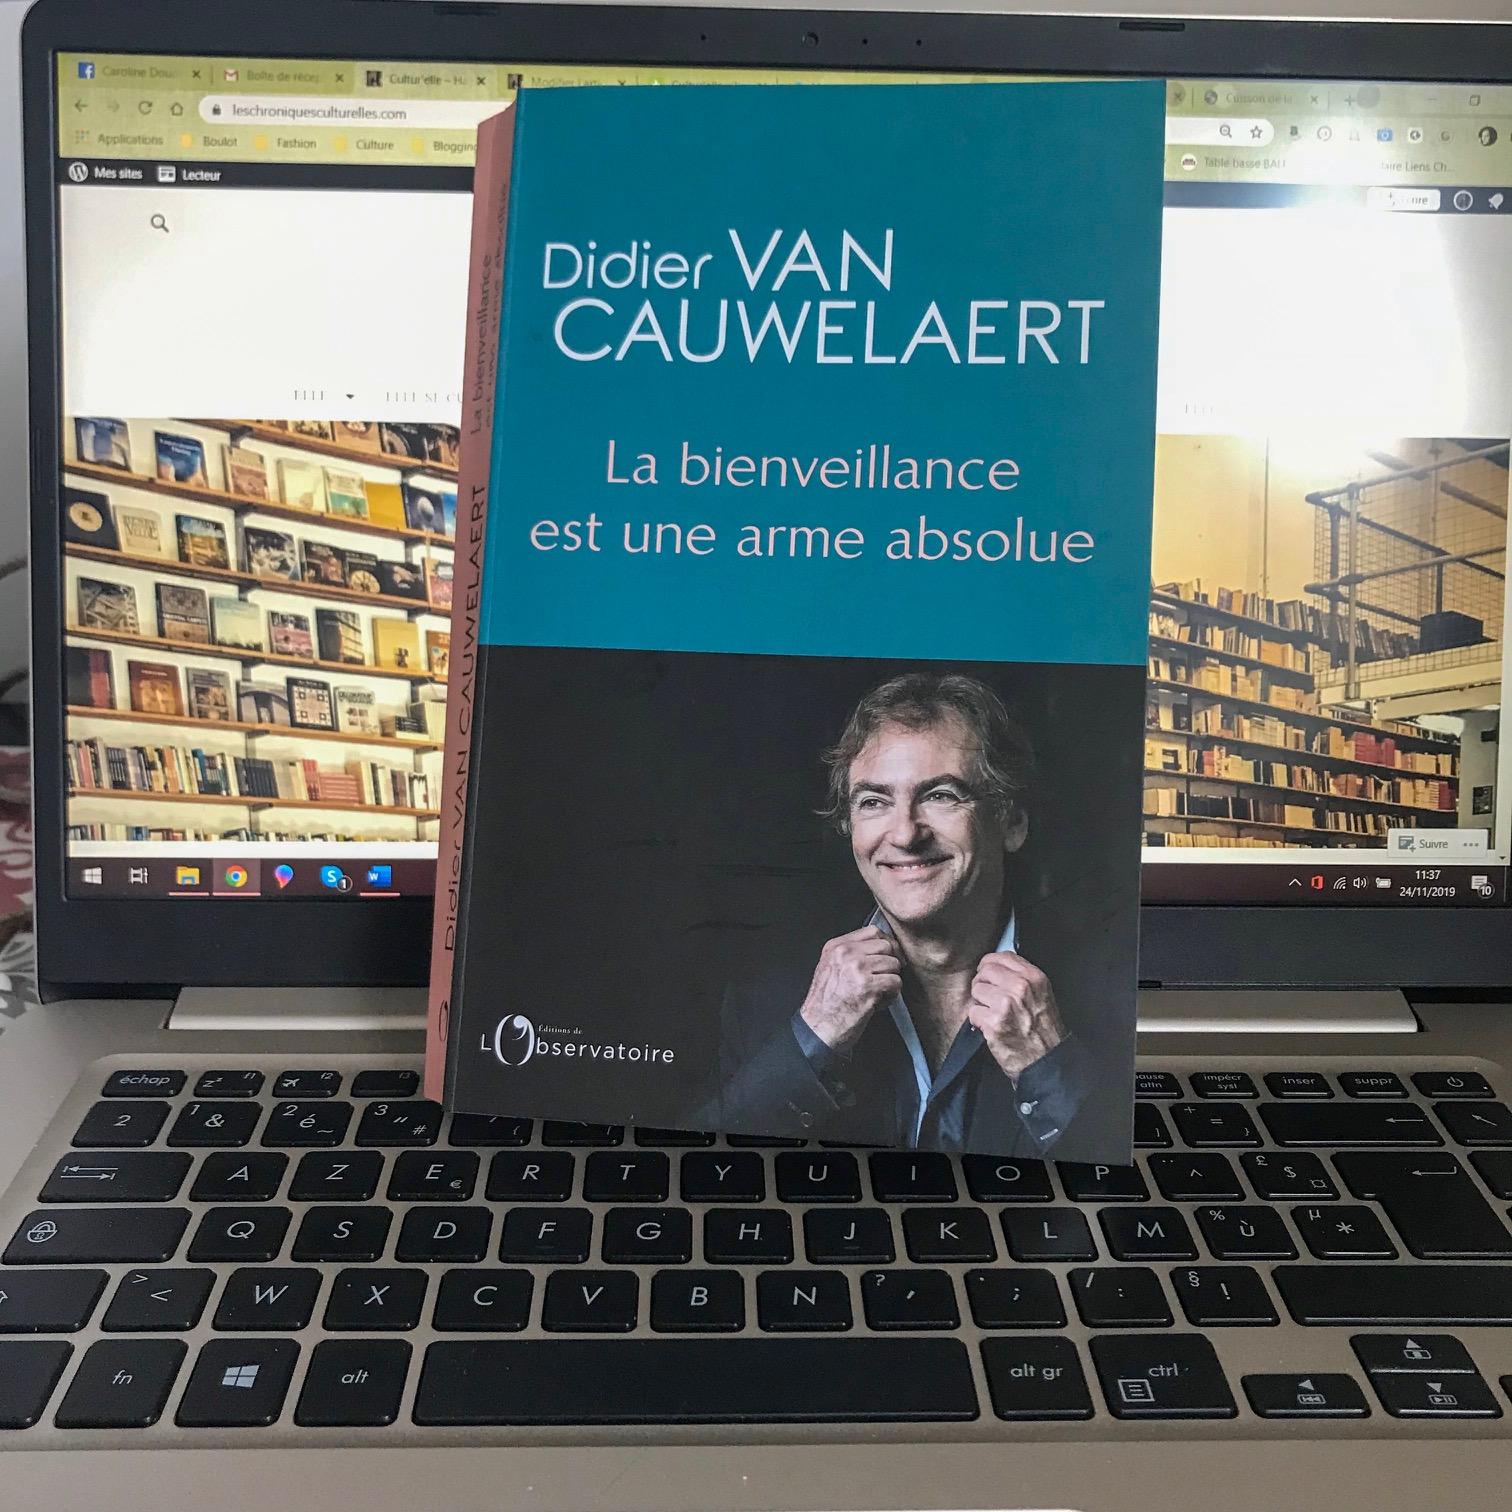 La bienveillance est une arme absolue, de Didier van Cauwelaert : de la sollicitude